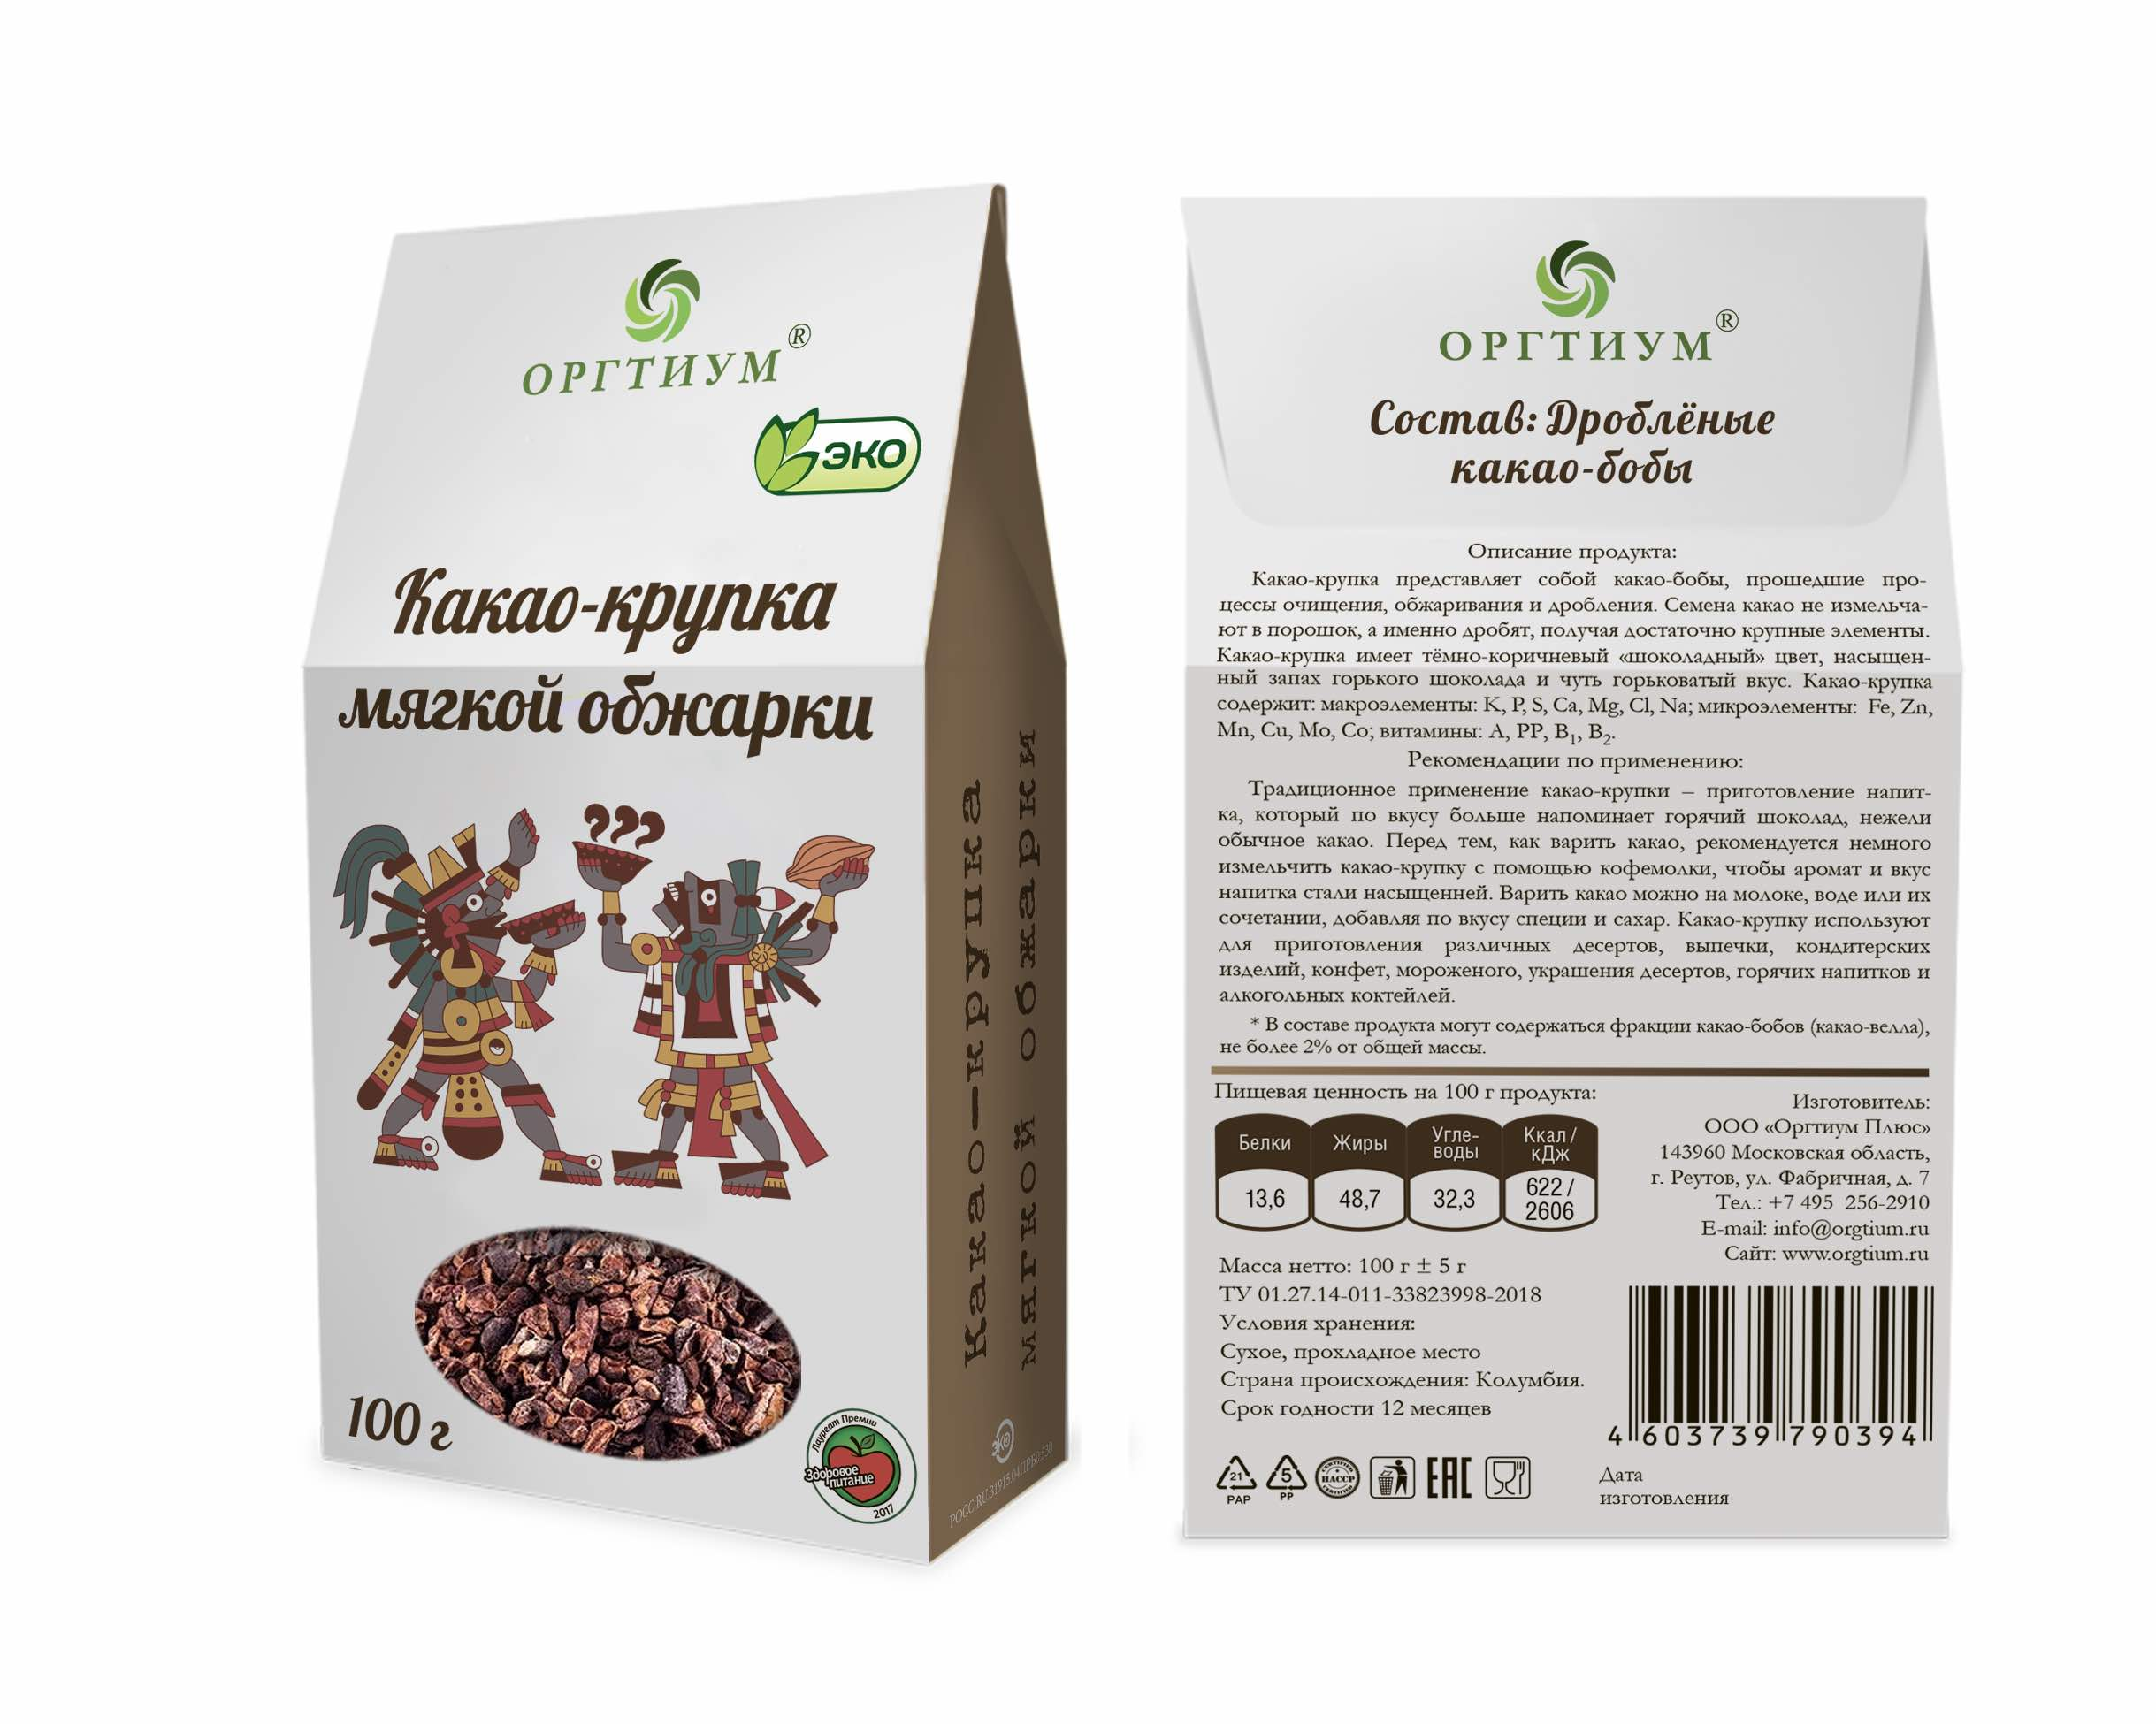 Какао-крупка Оргтиум мягкой обжарки 100 г фото